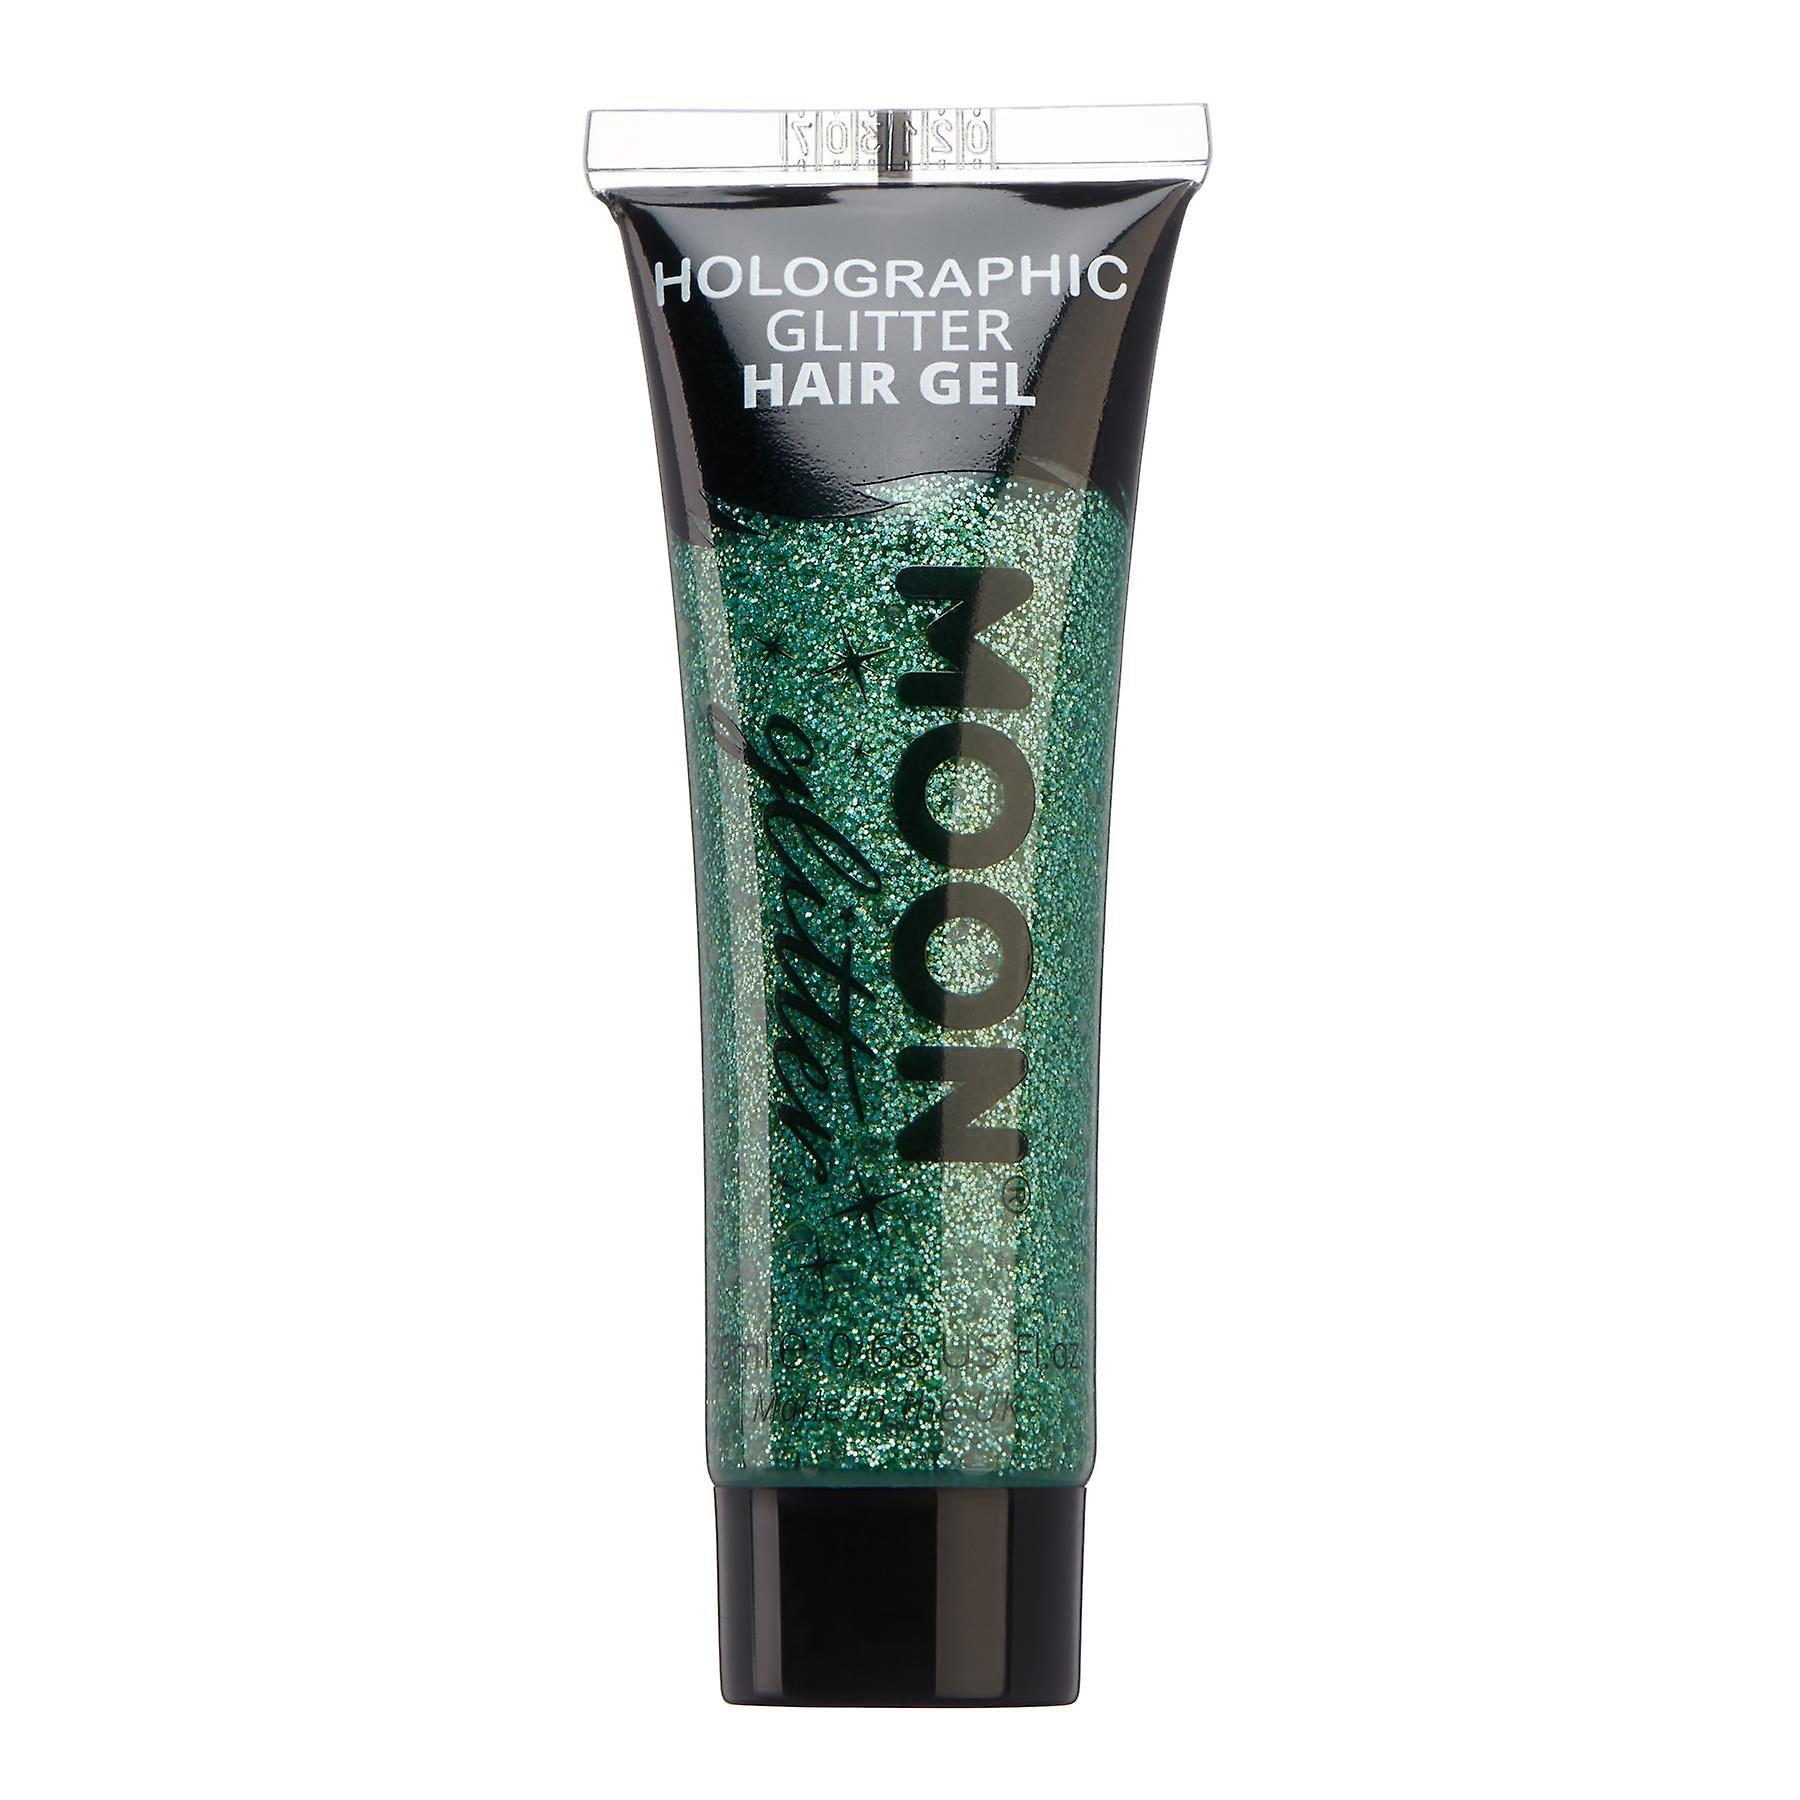 Holographic Glitter Hair Gel by Moon Glitter - 20ml - Green